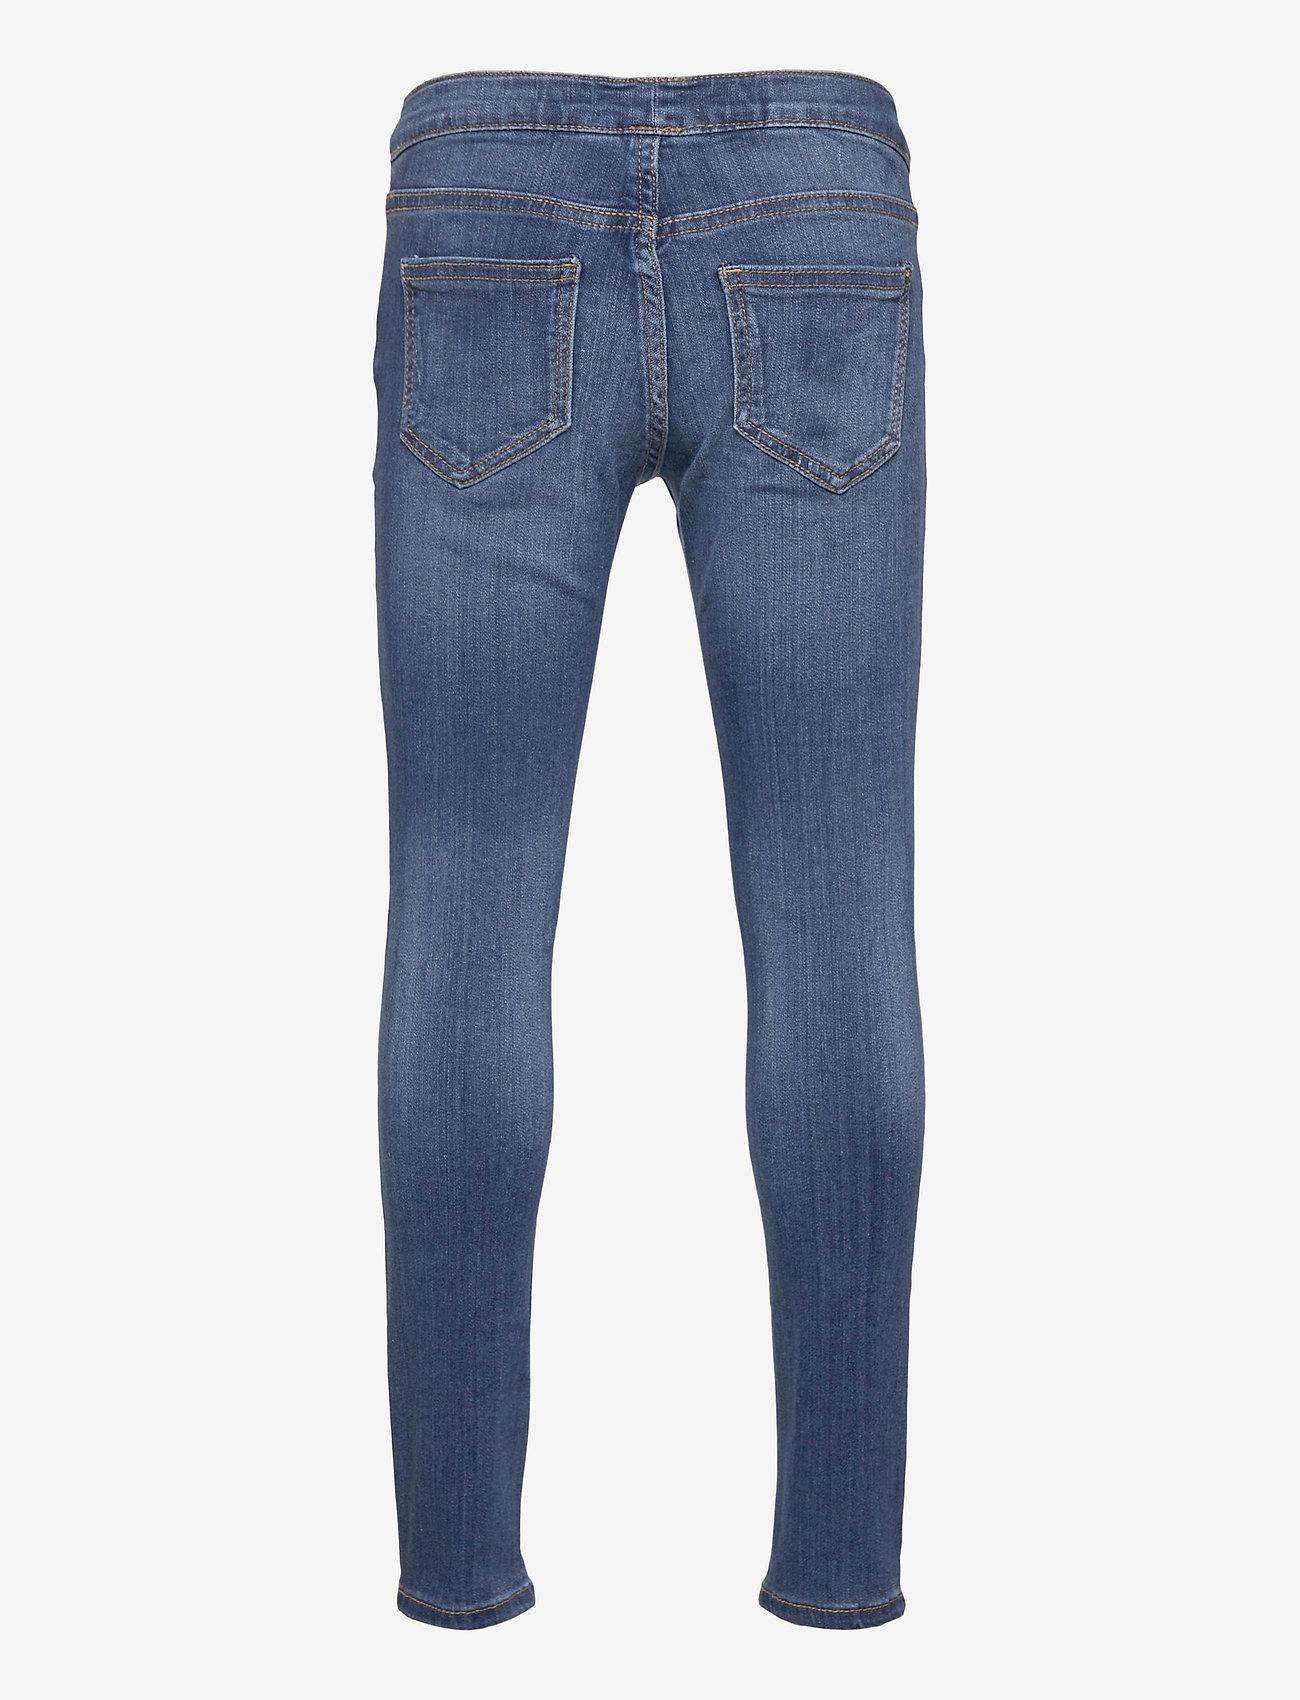 Lindex - trousers denim Ida blue - jeans - blue - 1